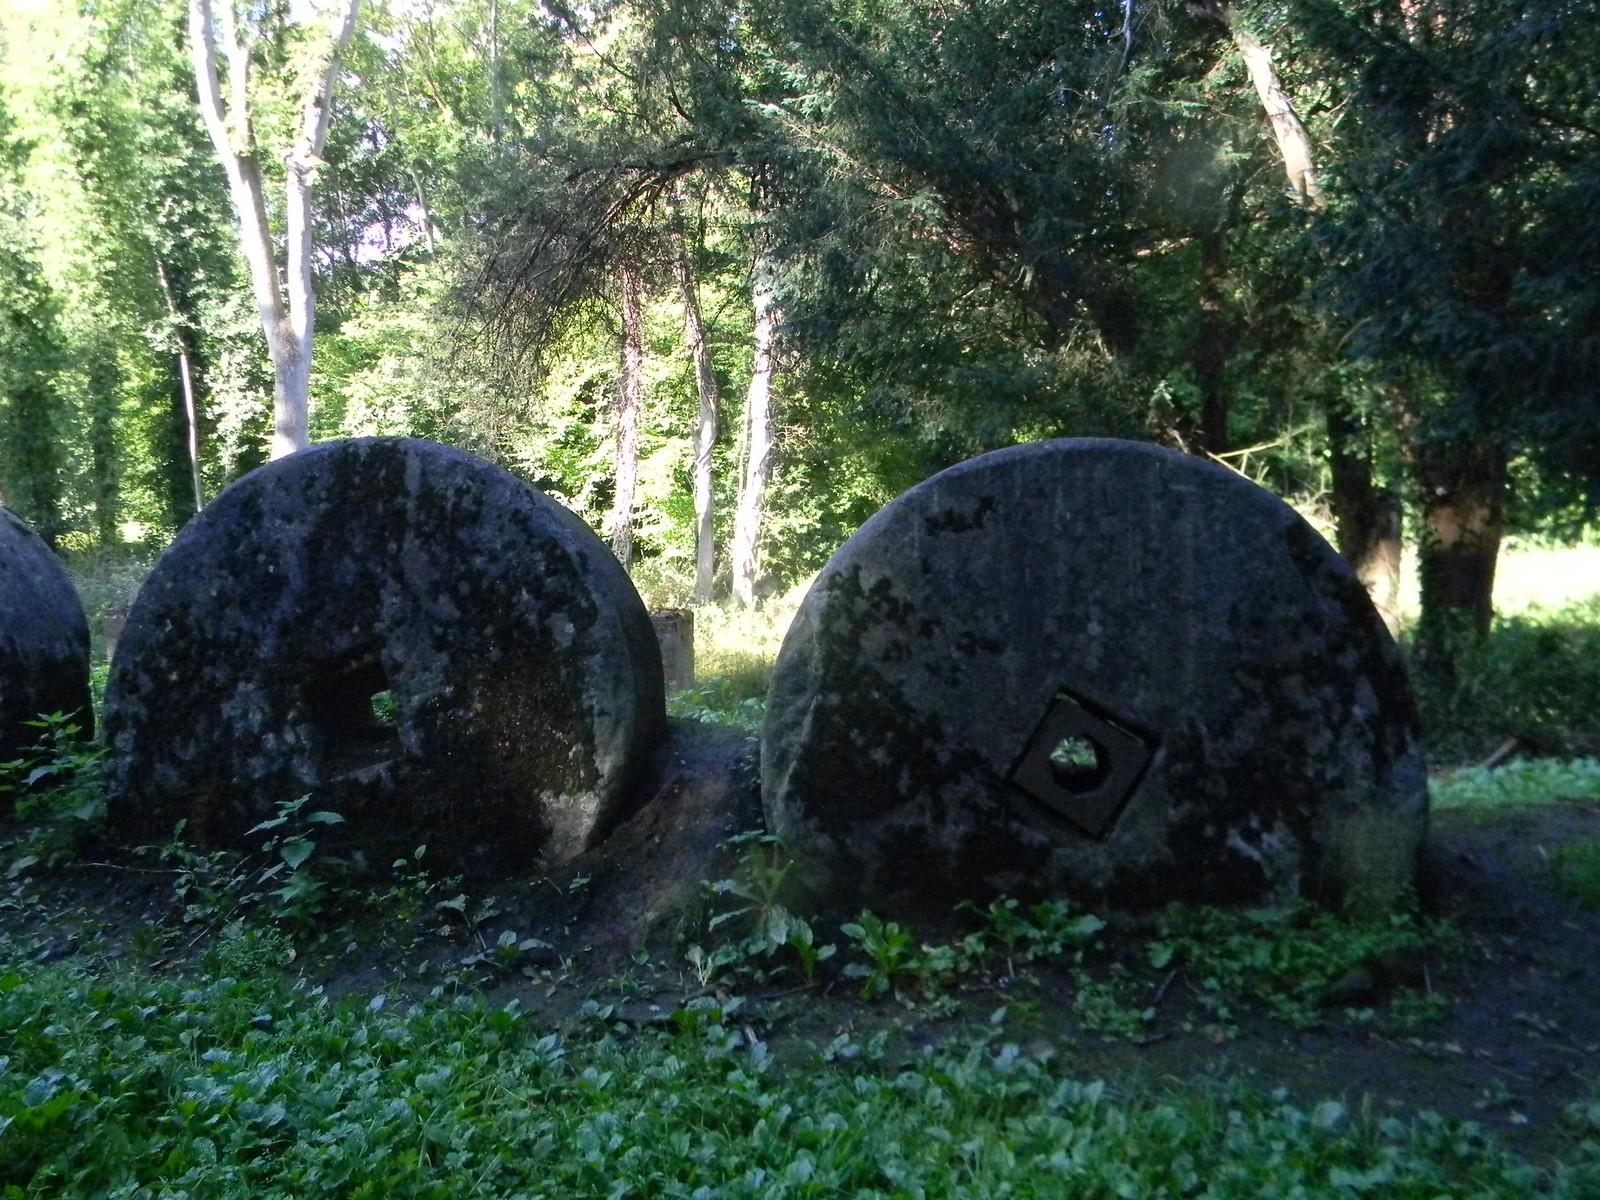 Millstones - Gunpowder works Guildford Circular via Albury.